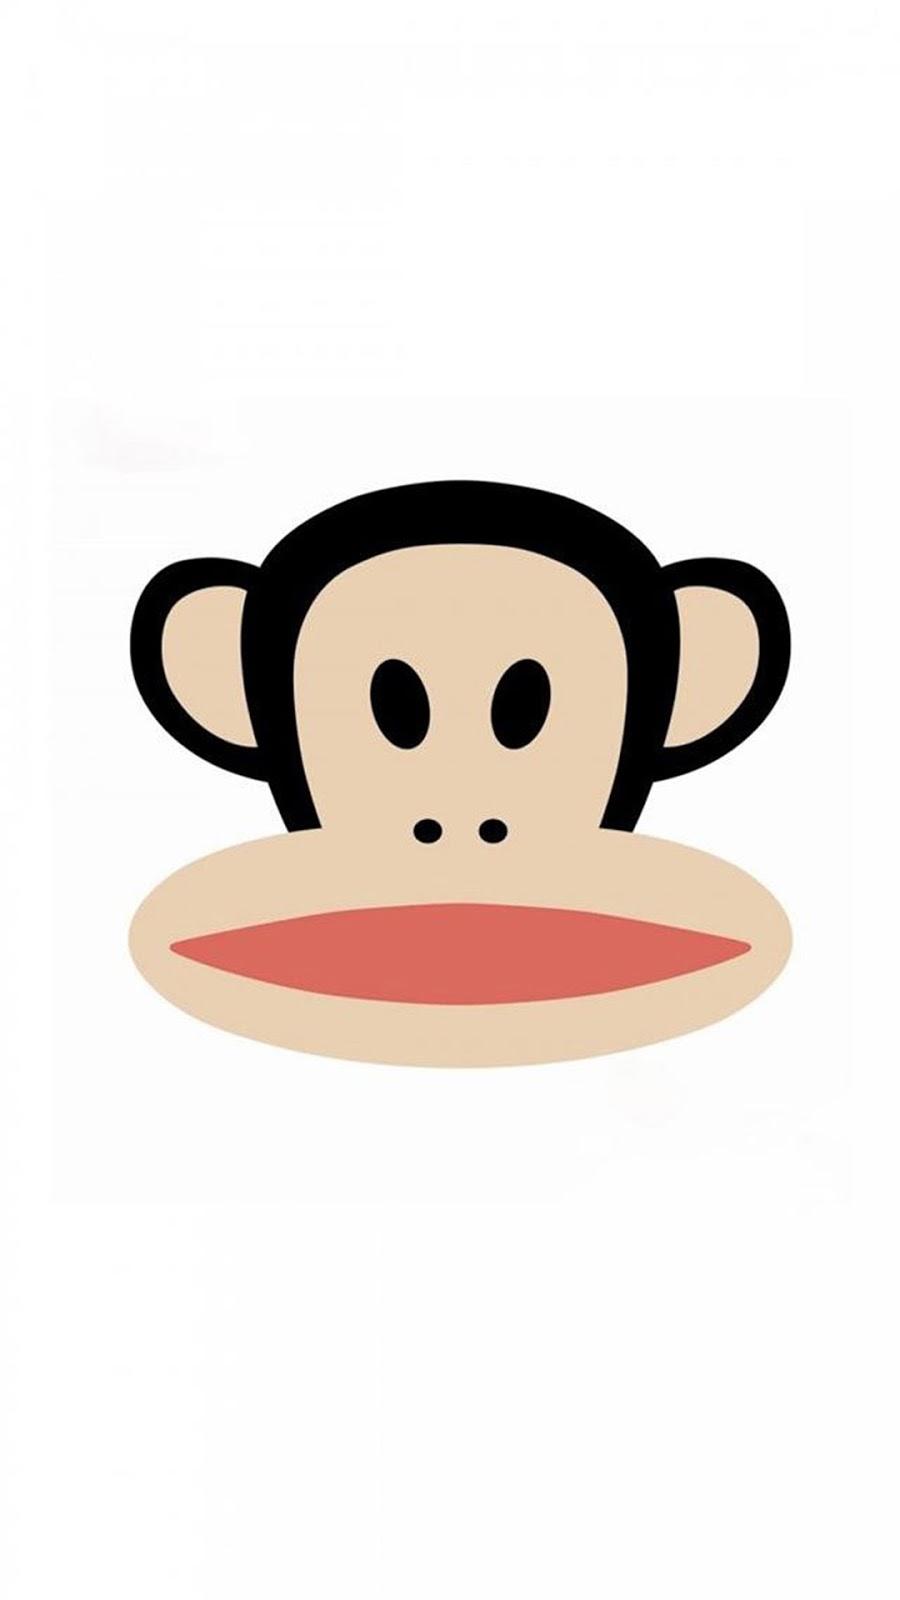 Monkey Face IPhone 7 Plus Wallpaper